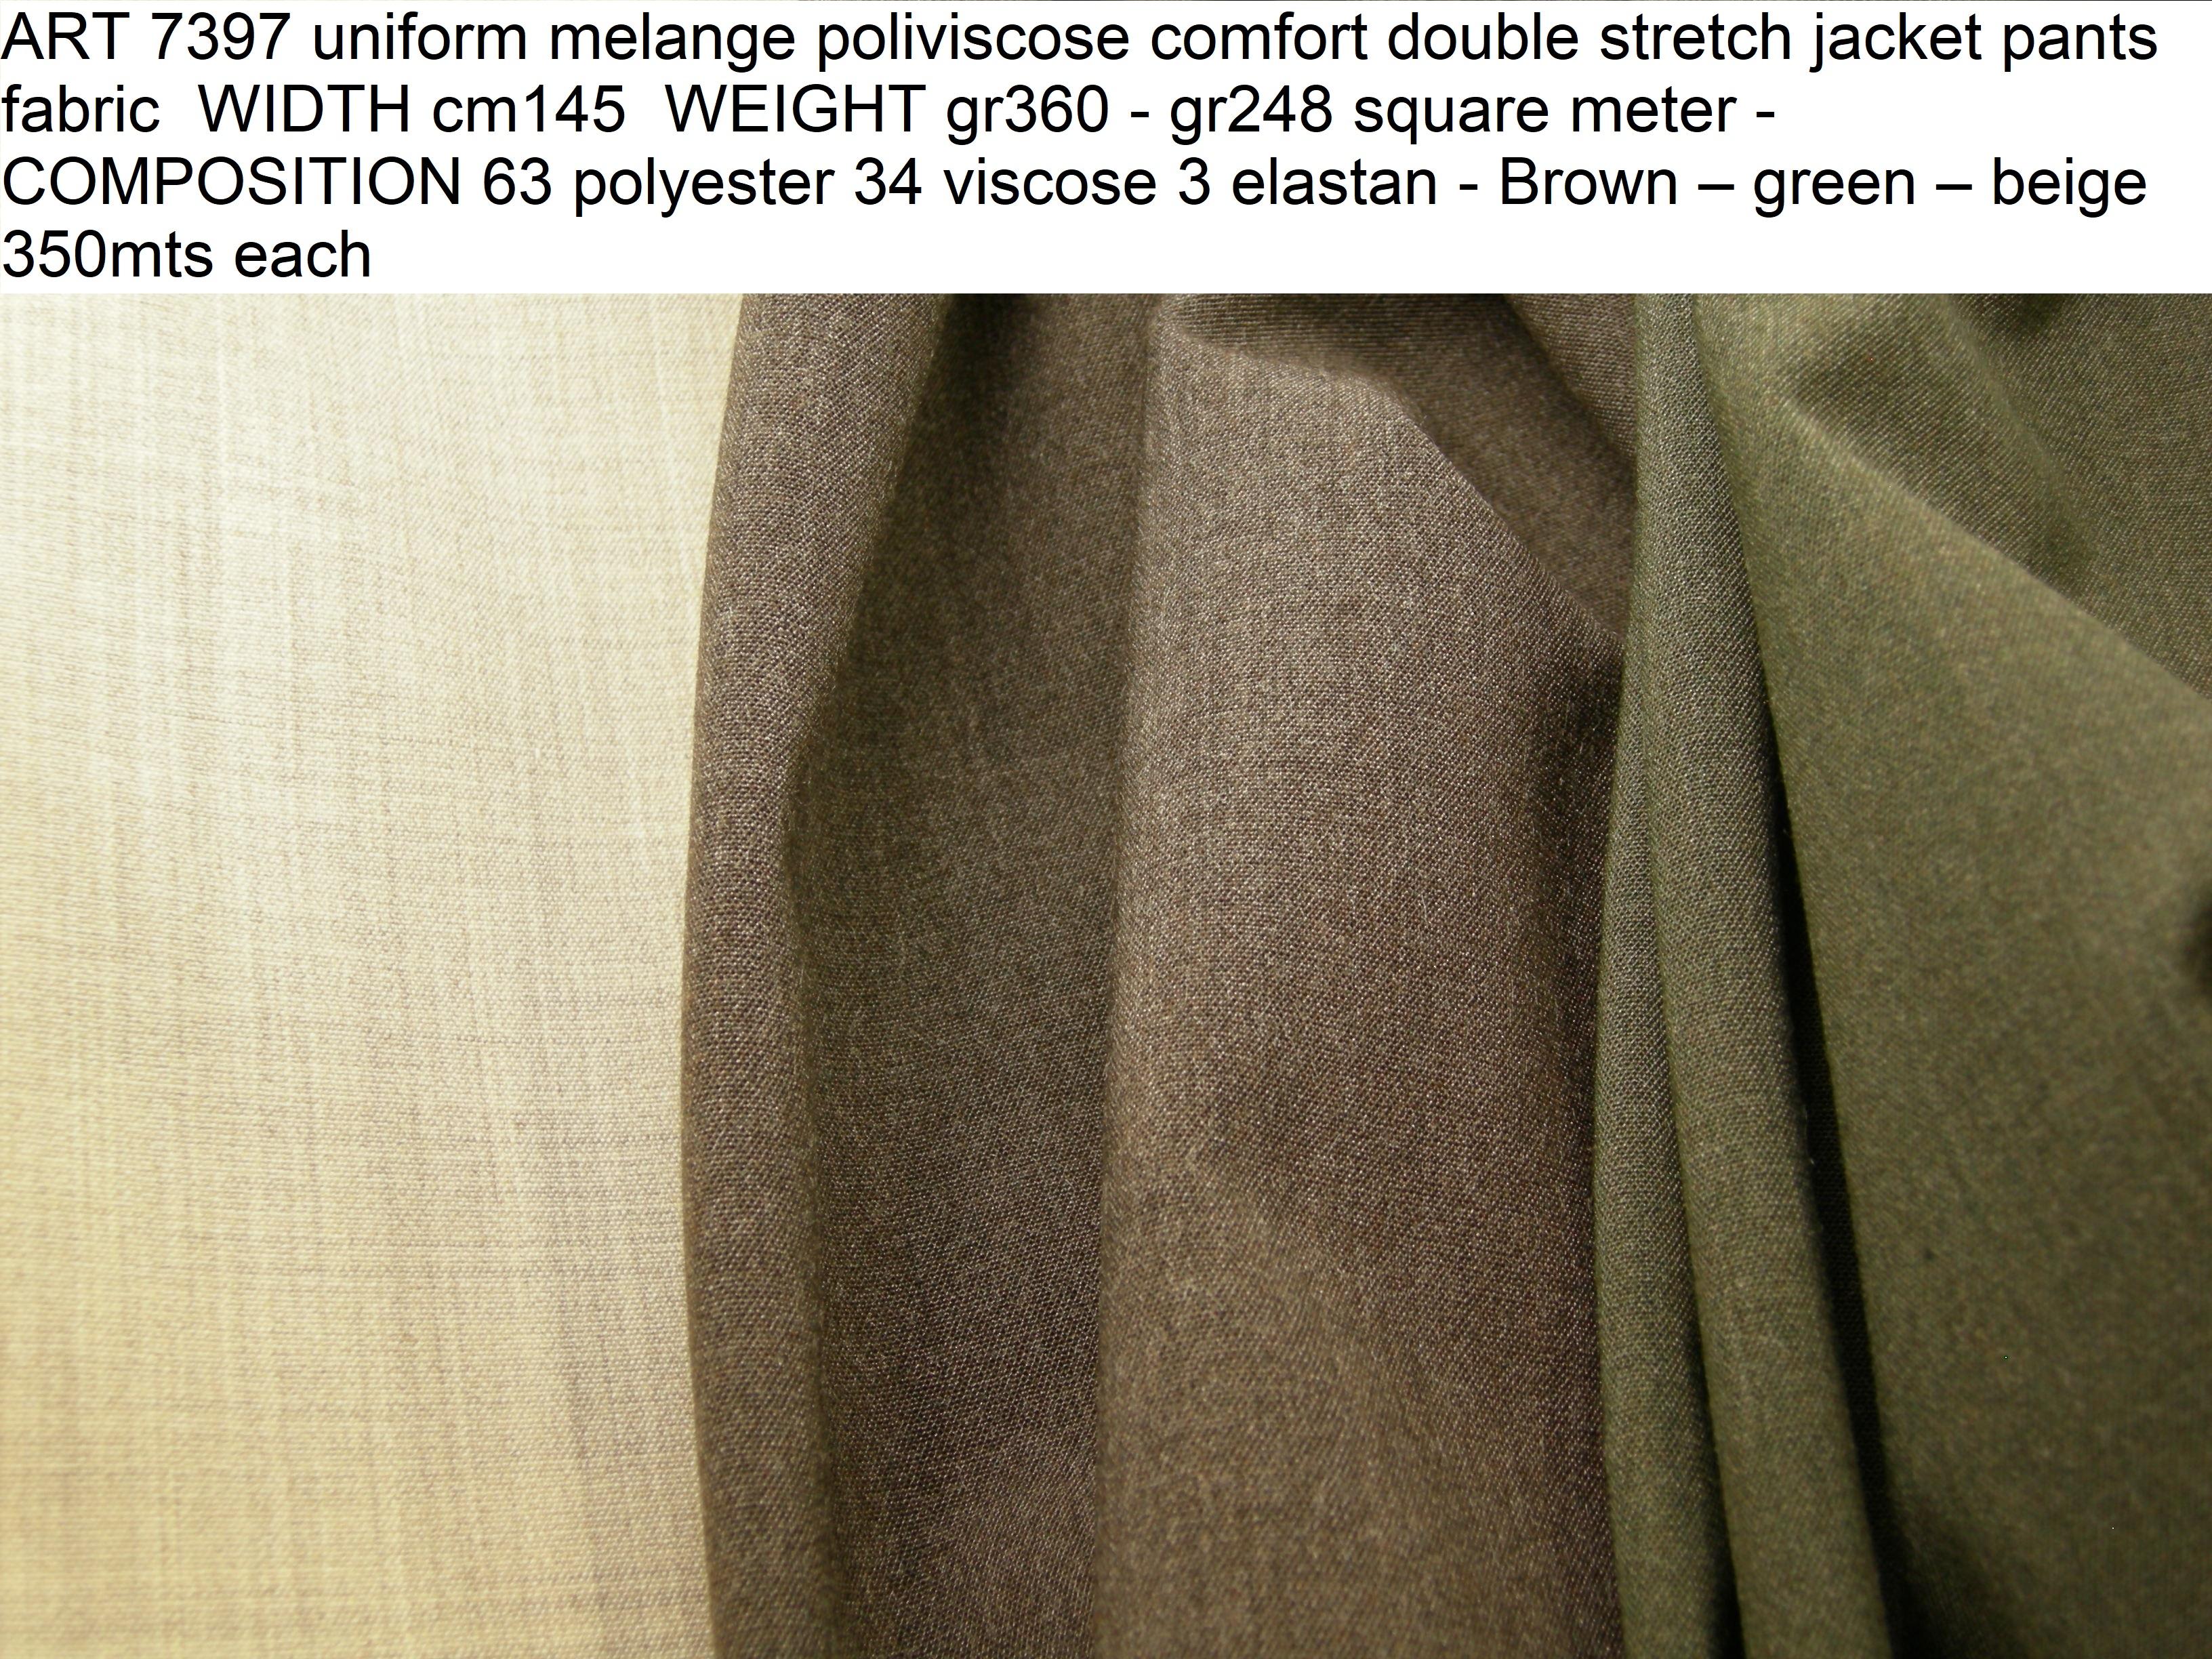 ART 7397 uniform melange poliviscose comfort double stretch jacket pants fabric WIDTH cm145 WEIGHT gr360 - gr248 square meter - Brown green beige 350mts each